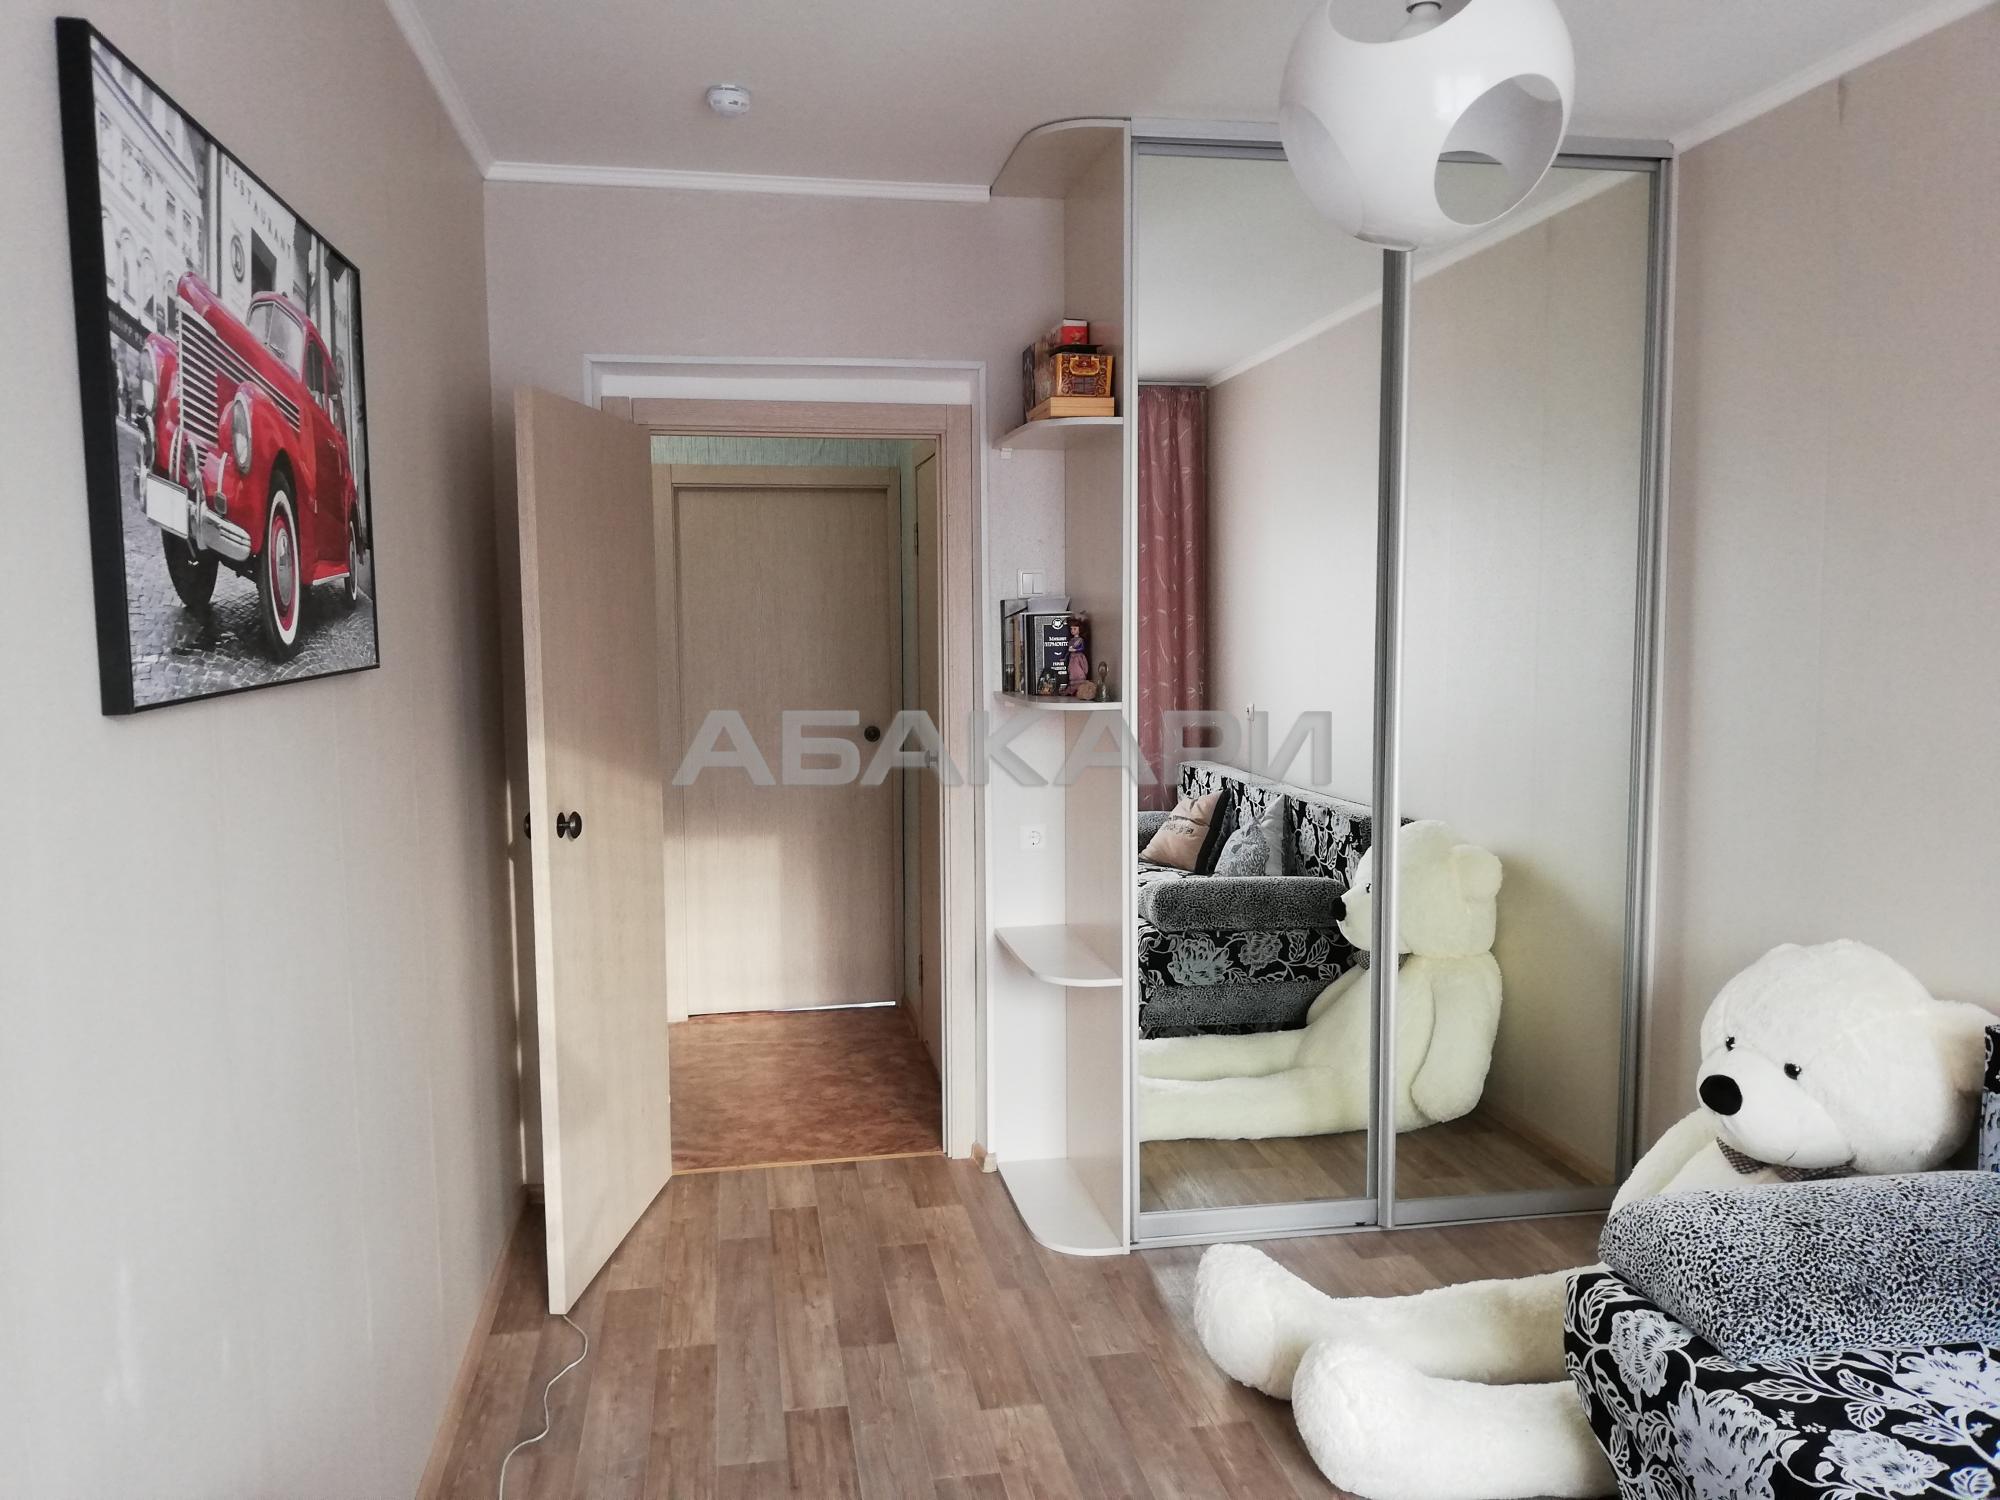 4к квартира Караульная улица, 46 | 25000 | аренда в Красноярске фото 0